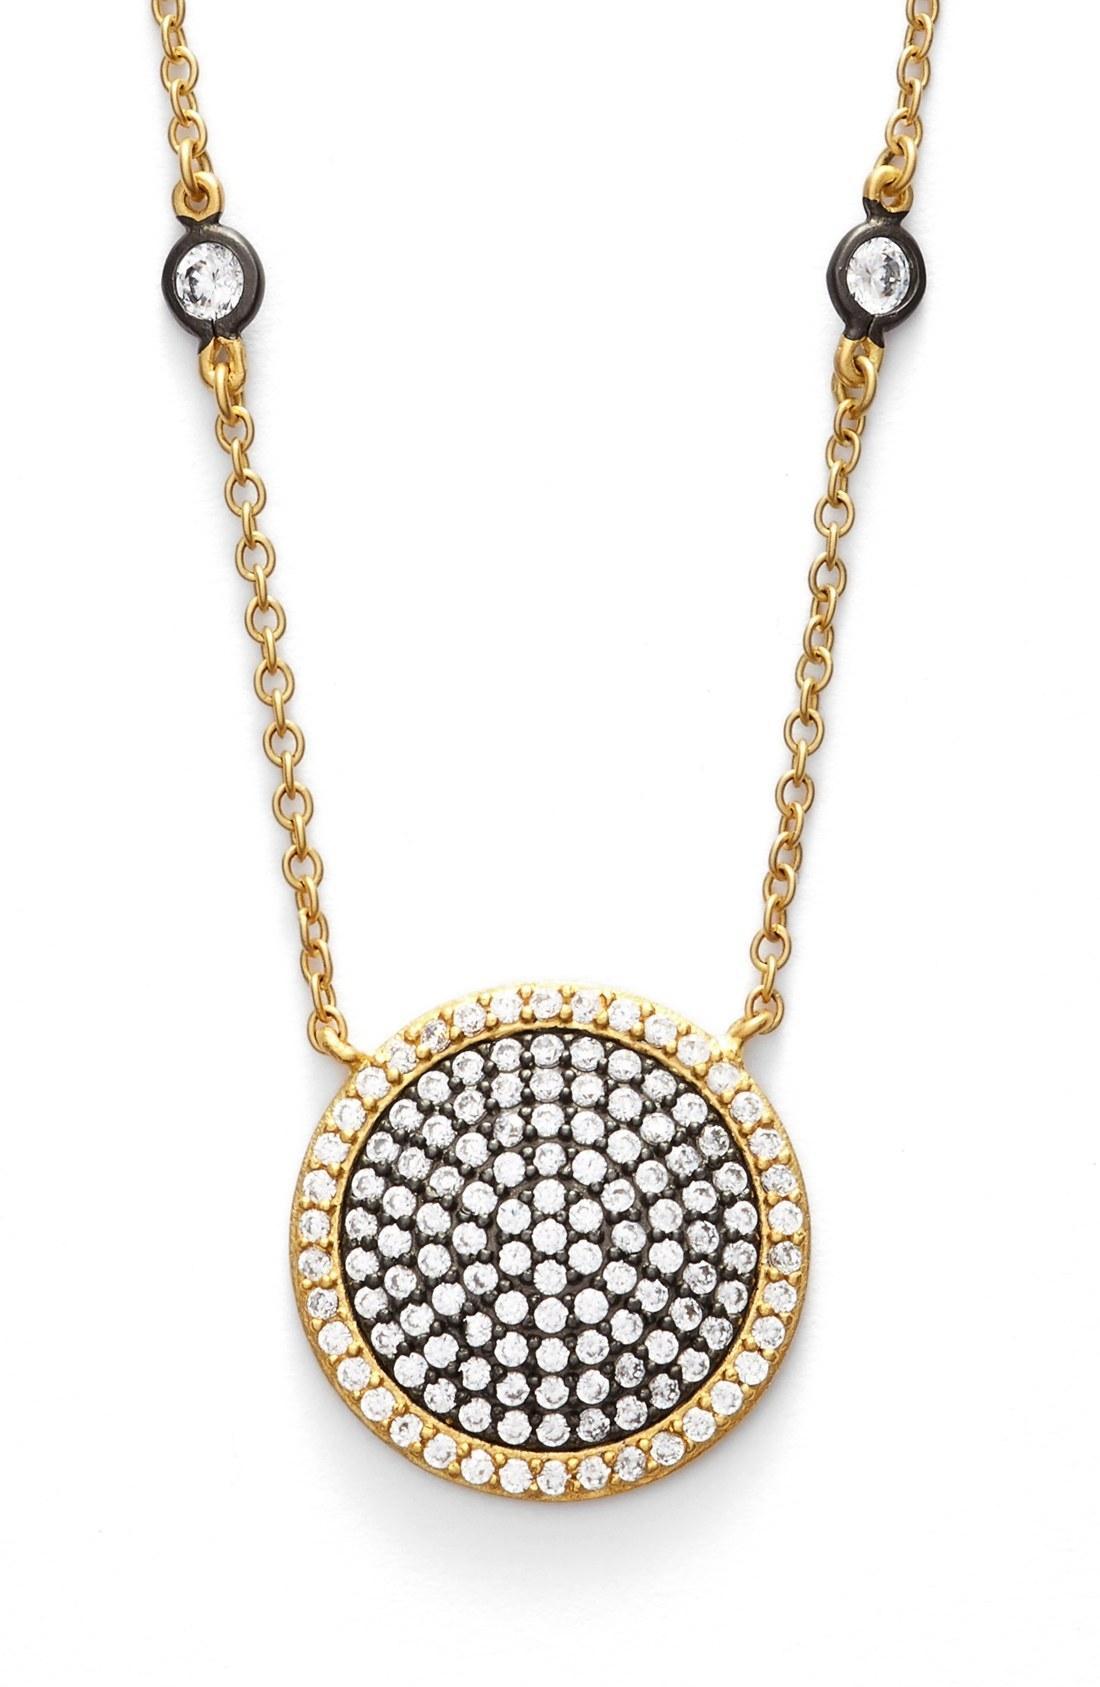 Freida Rothman 'metropolitan' Pave Pendant Necklace In Gold/ Gunmetal/ Clear